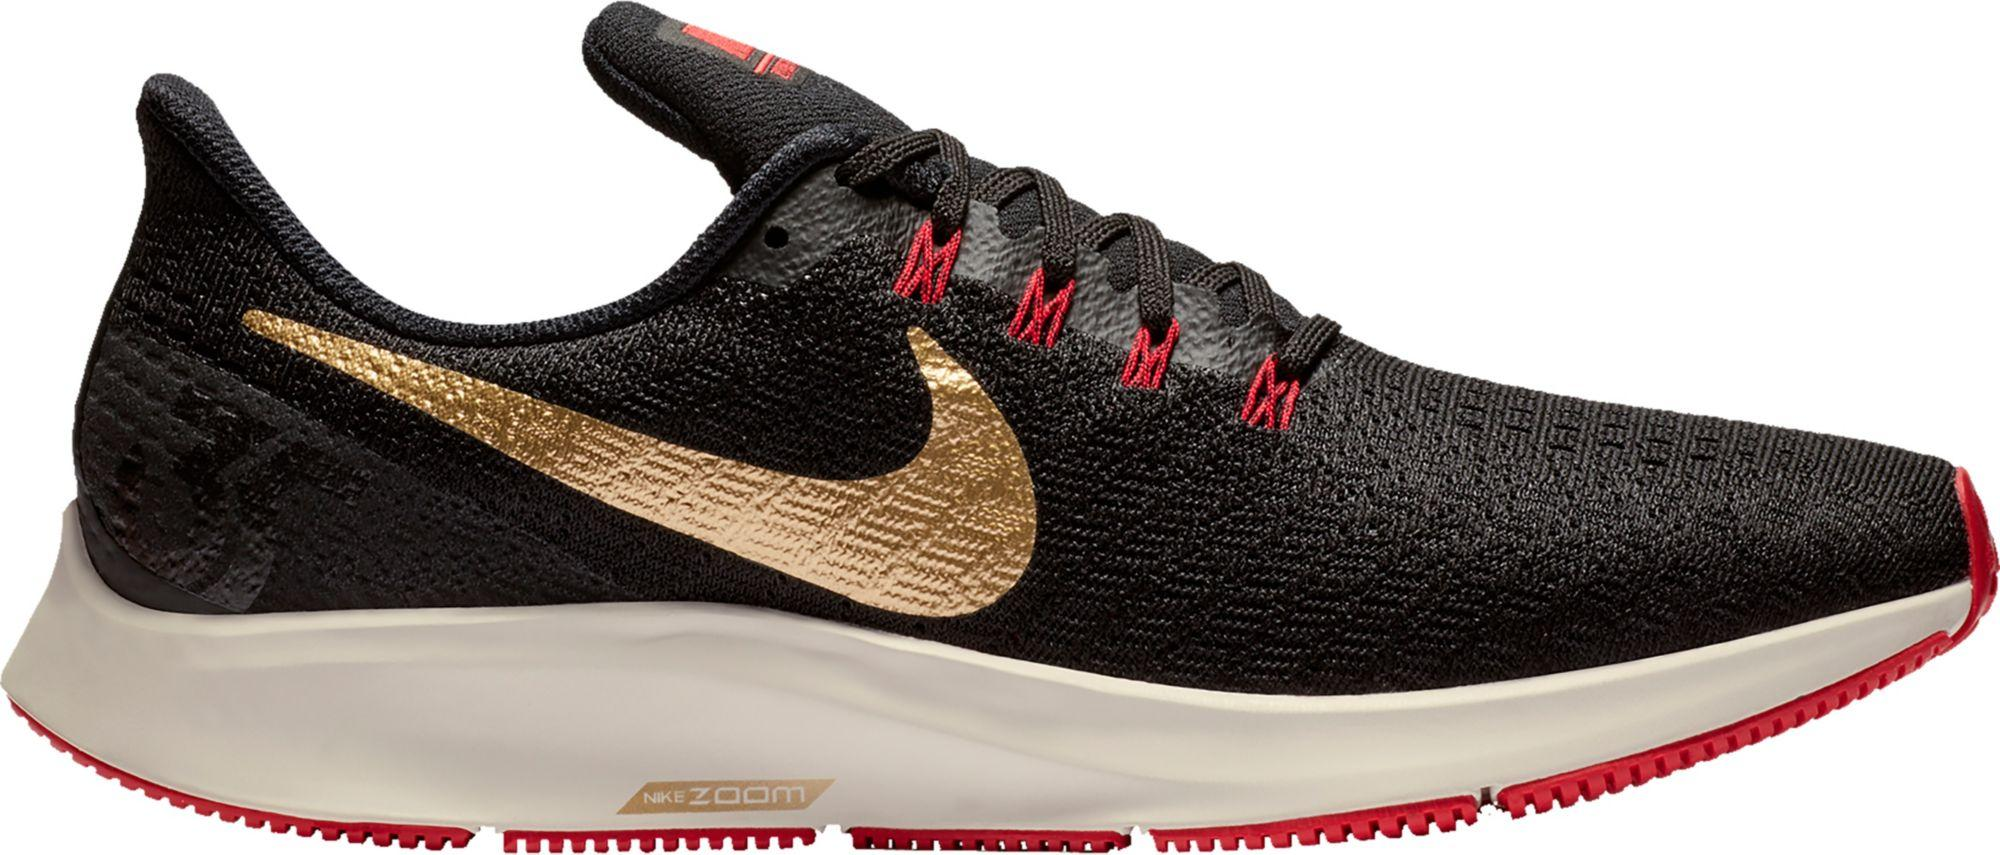 236c28de73ab Lyst - Nike Air Zoom Pegasus 35 Running Shoes in Black for Men